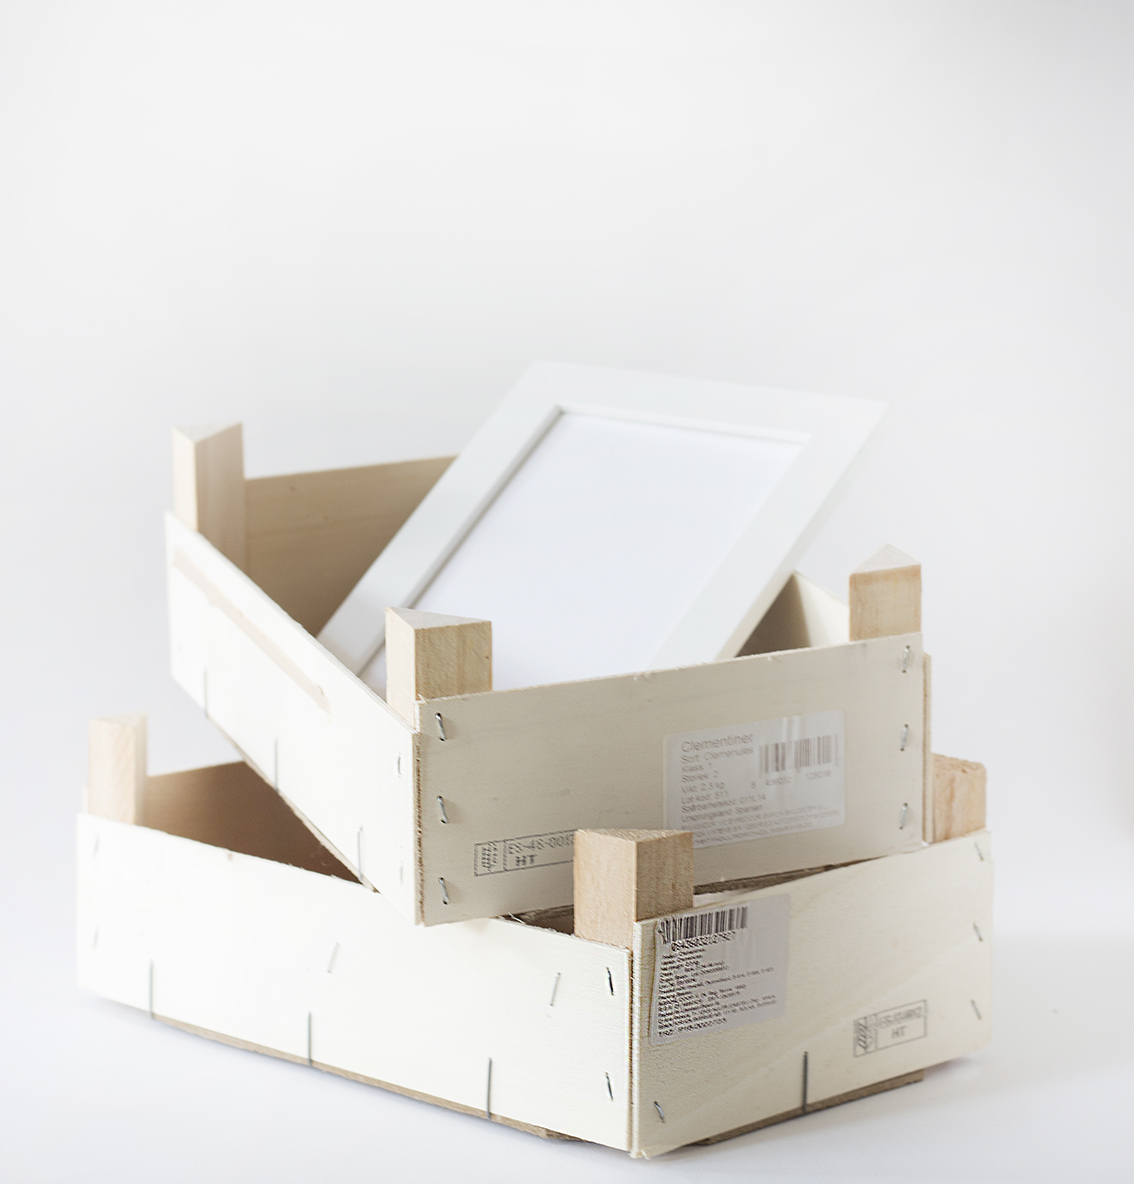 Dekorerade trälådor | Pysselbolaget